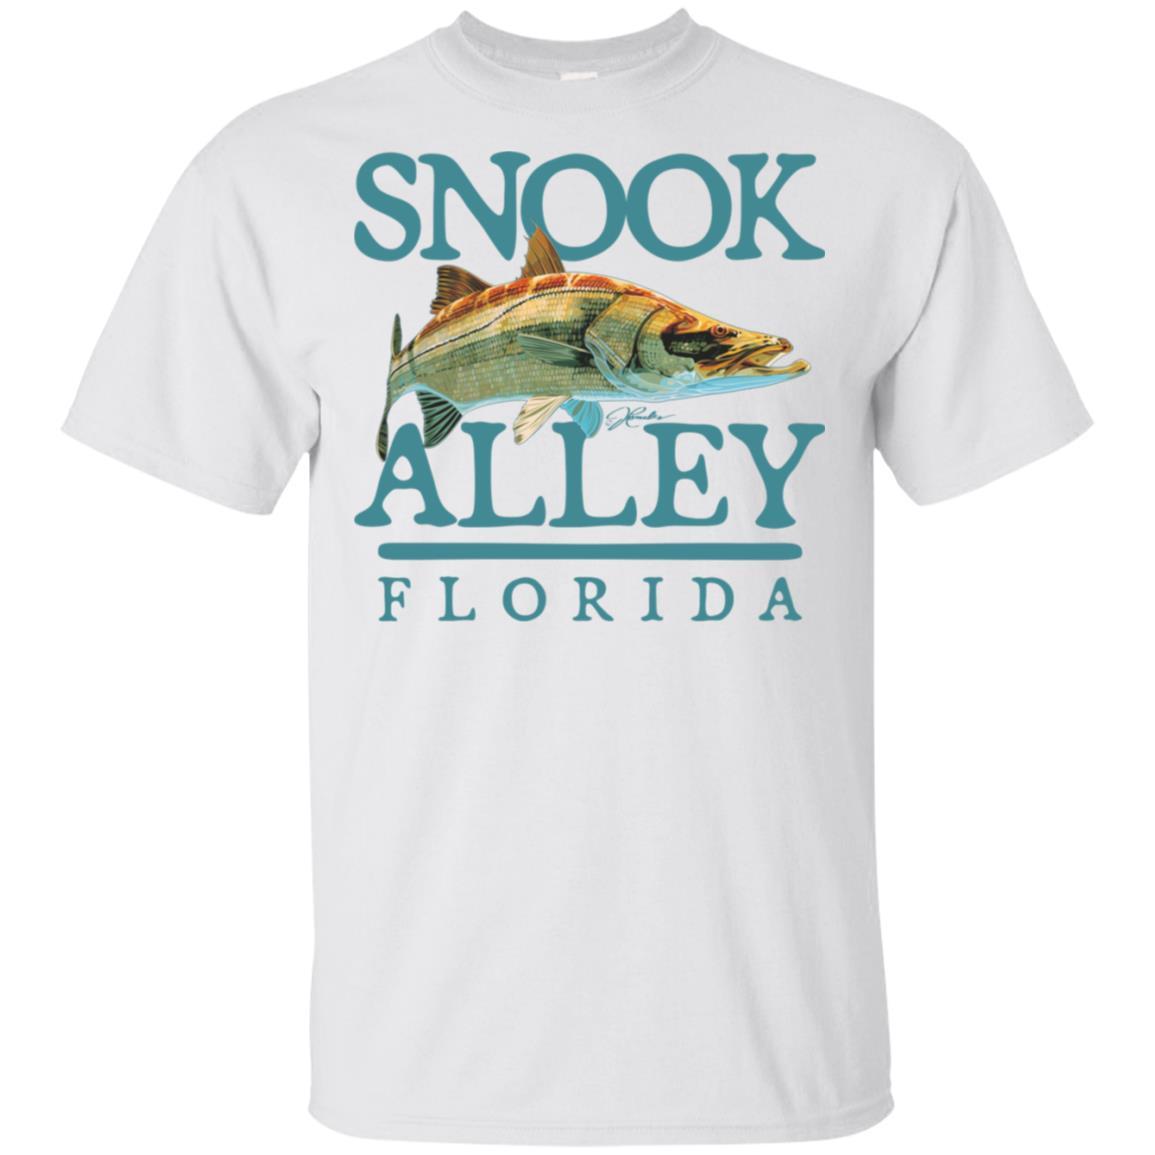 JCombs Snook Alley, Florida Unisex Short Sleeve